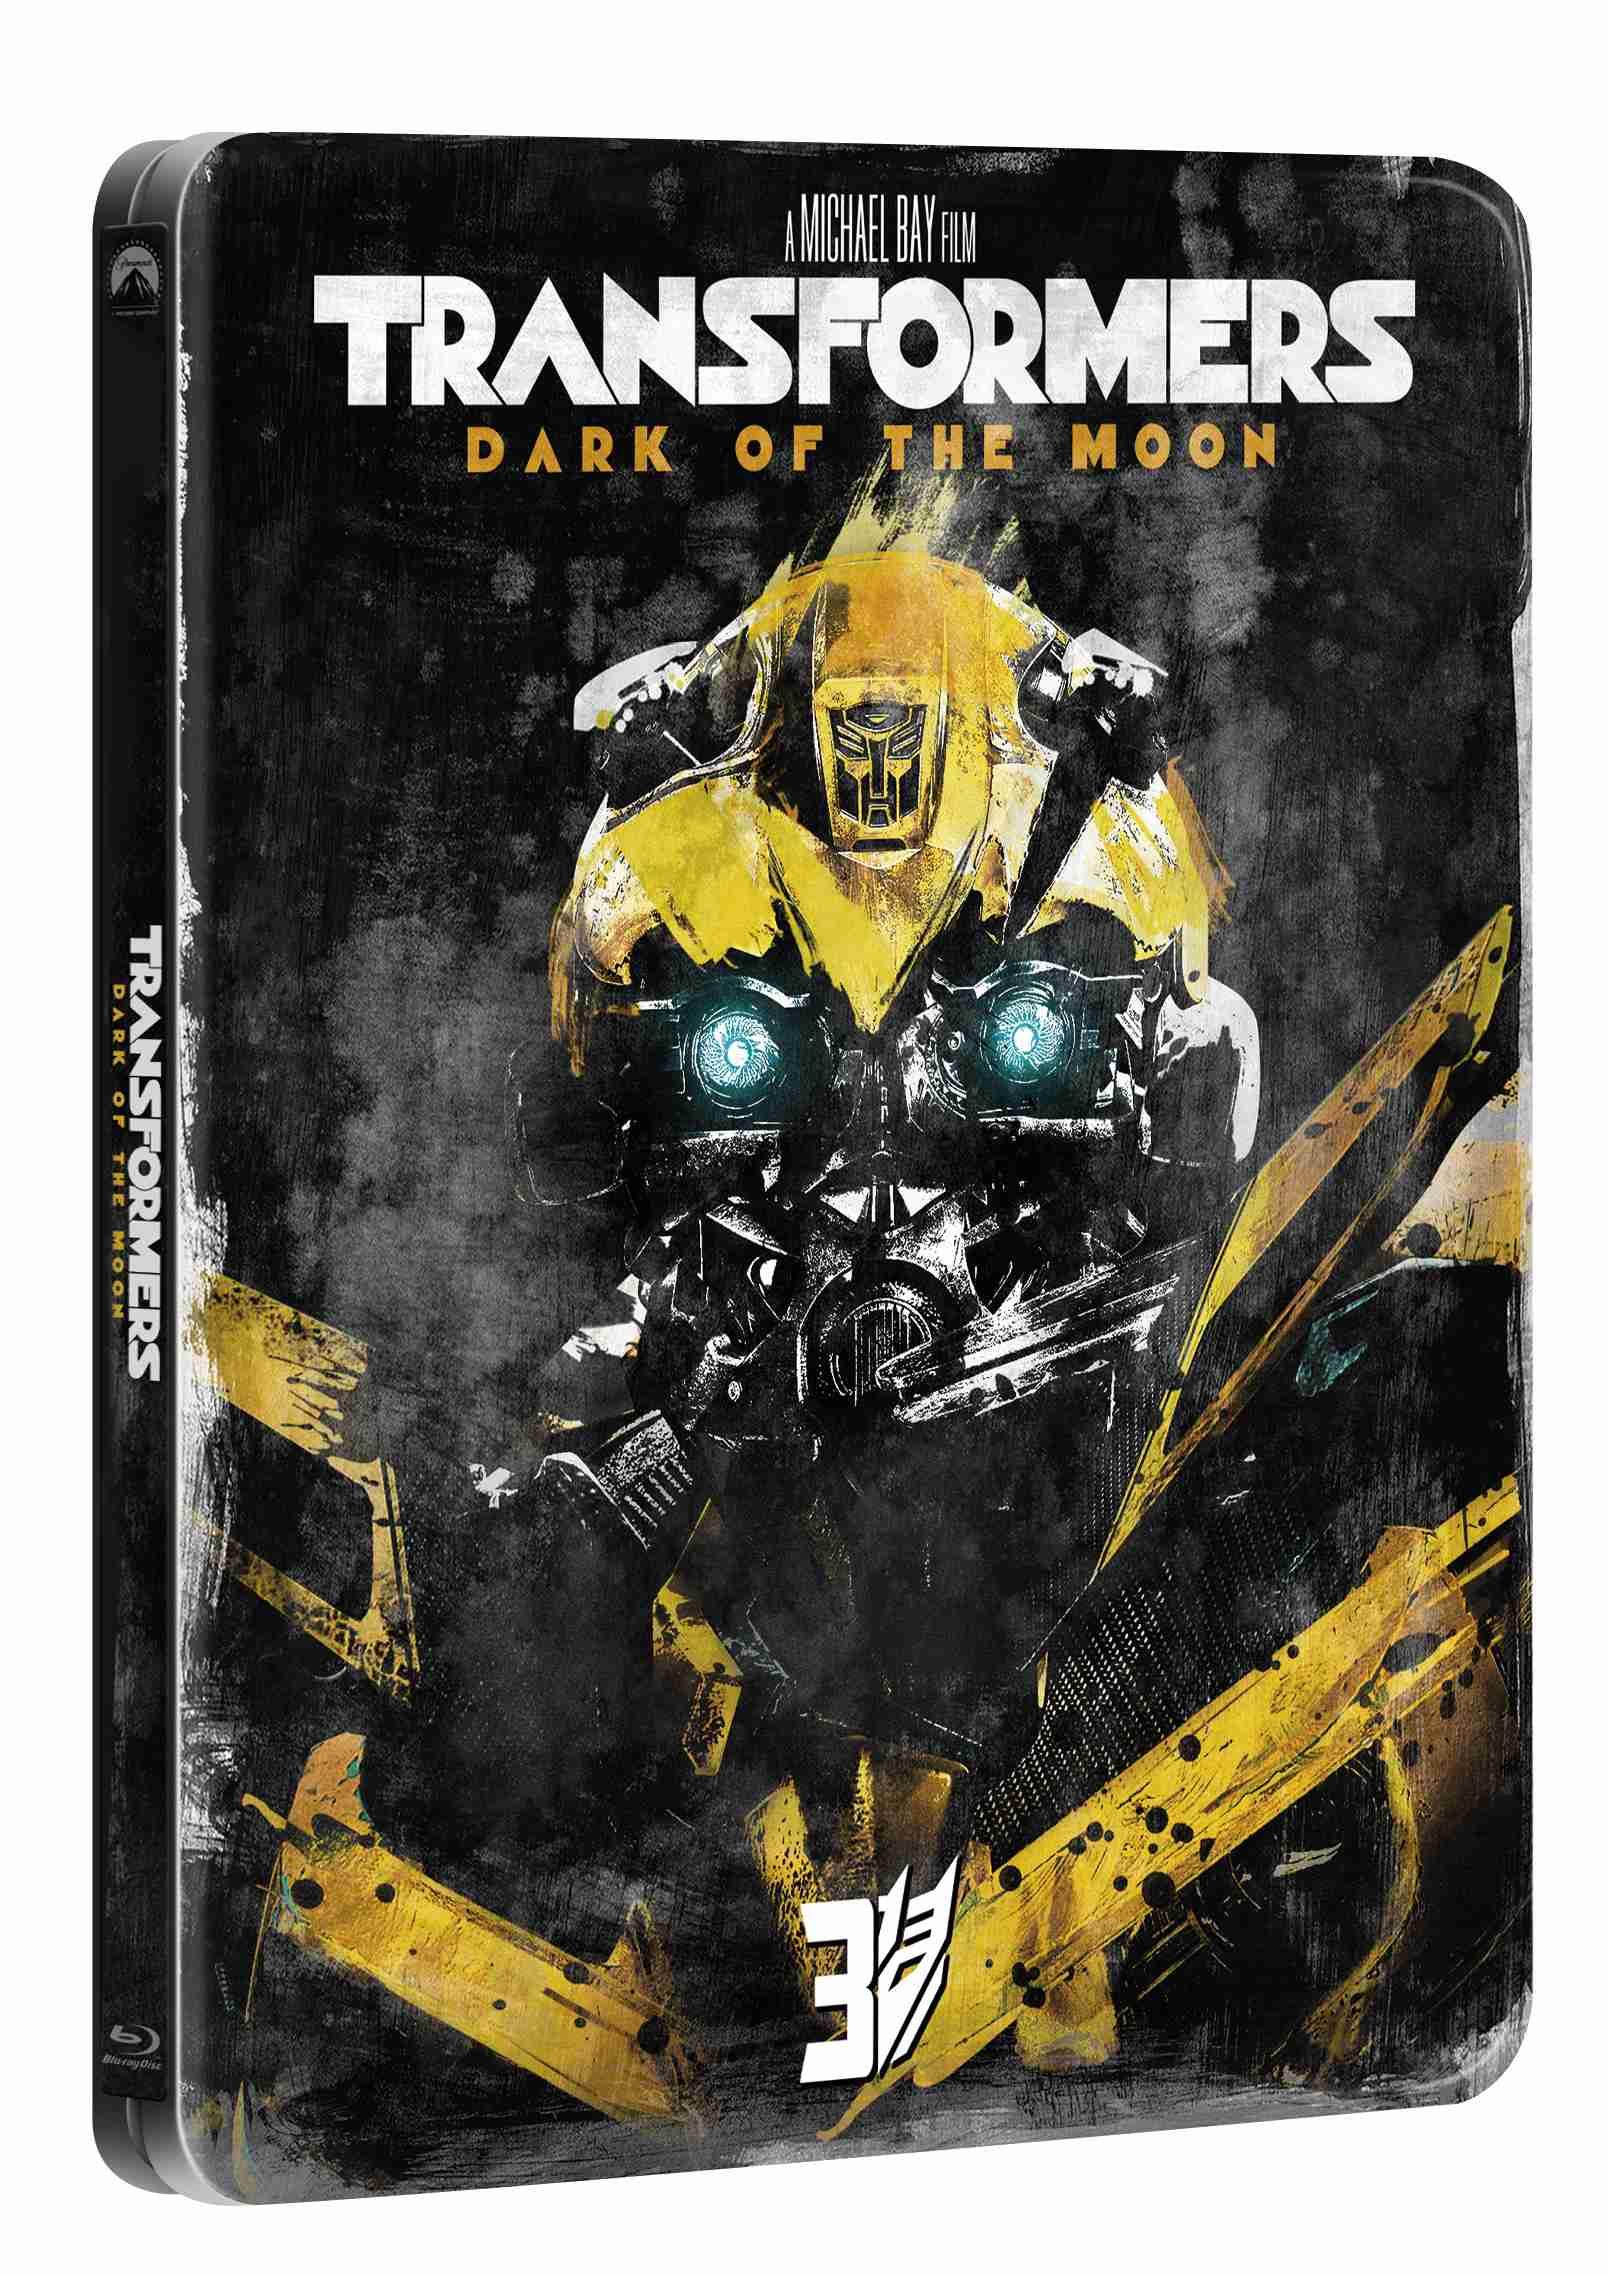 TRANSFORMERS 3 (Edice 10 let) - Blu-ray STEELBOOK